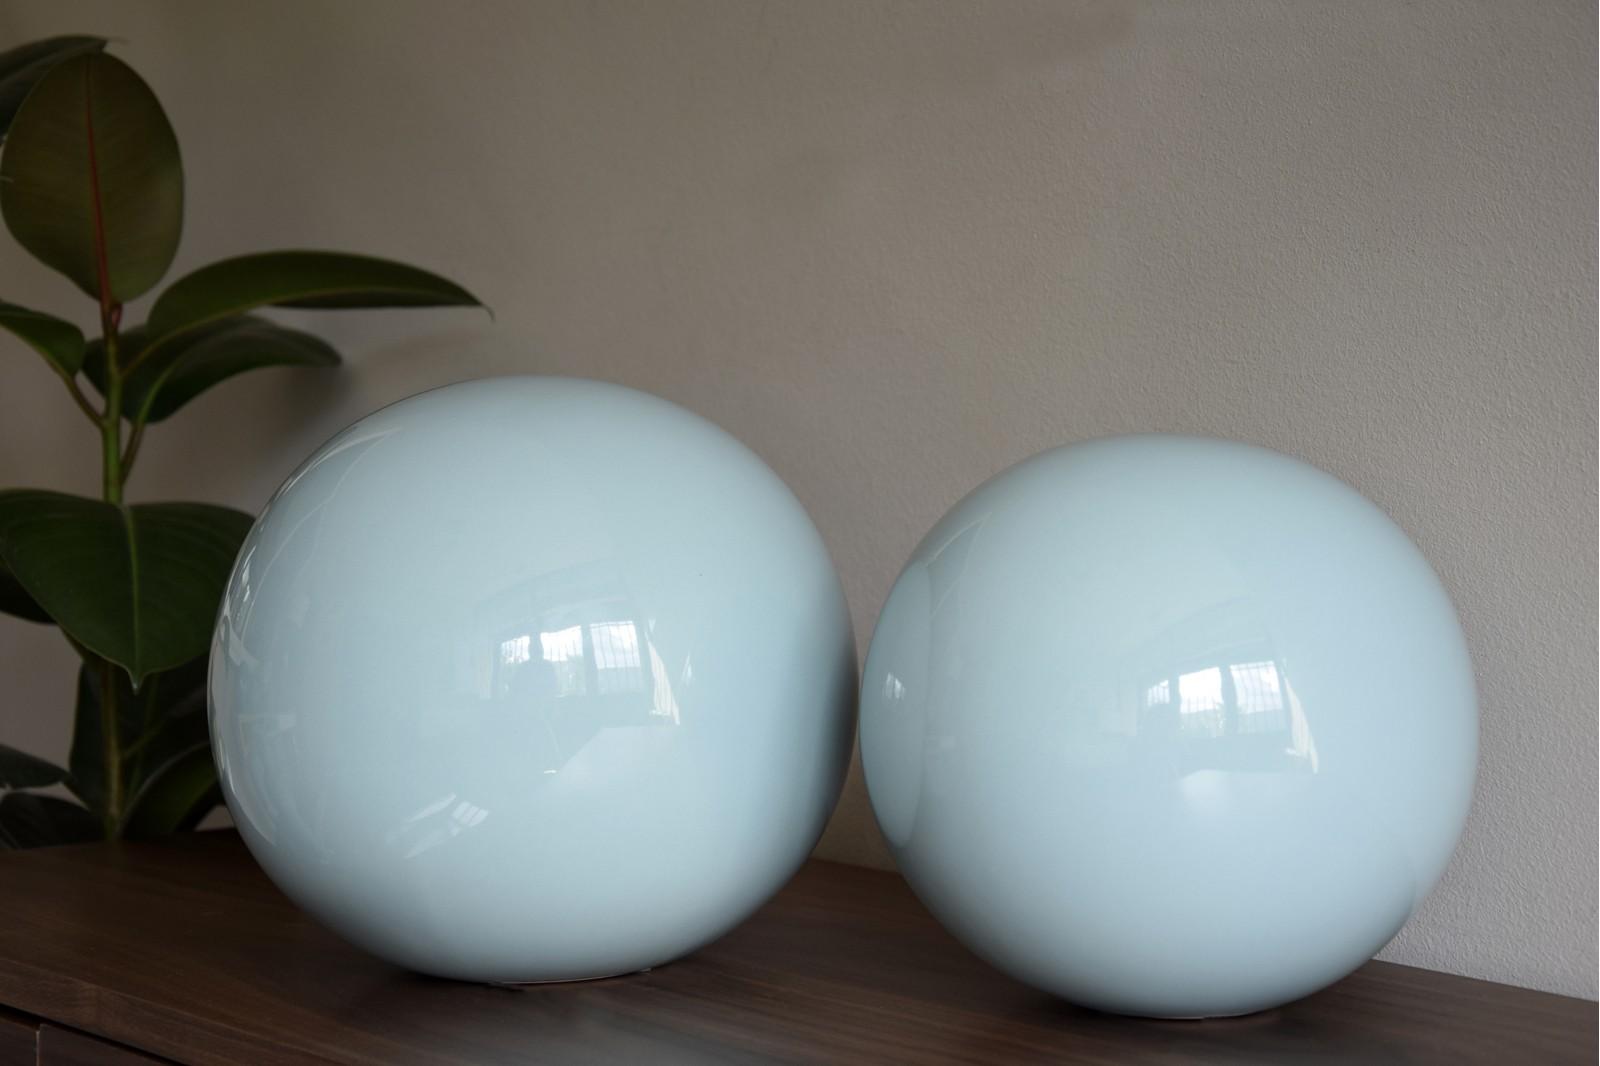 CERAMIC PLAIN BLUE BALLS COLLECTION XL